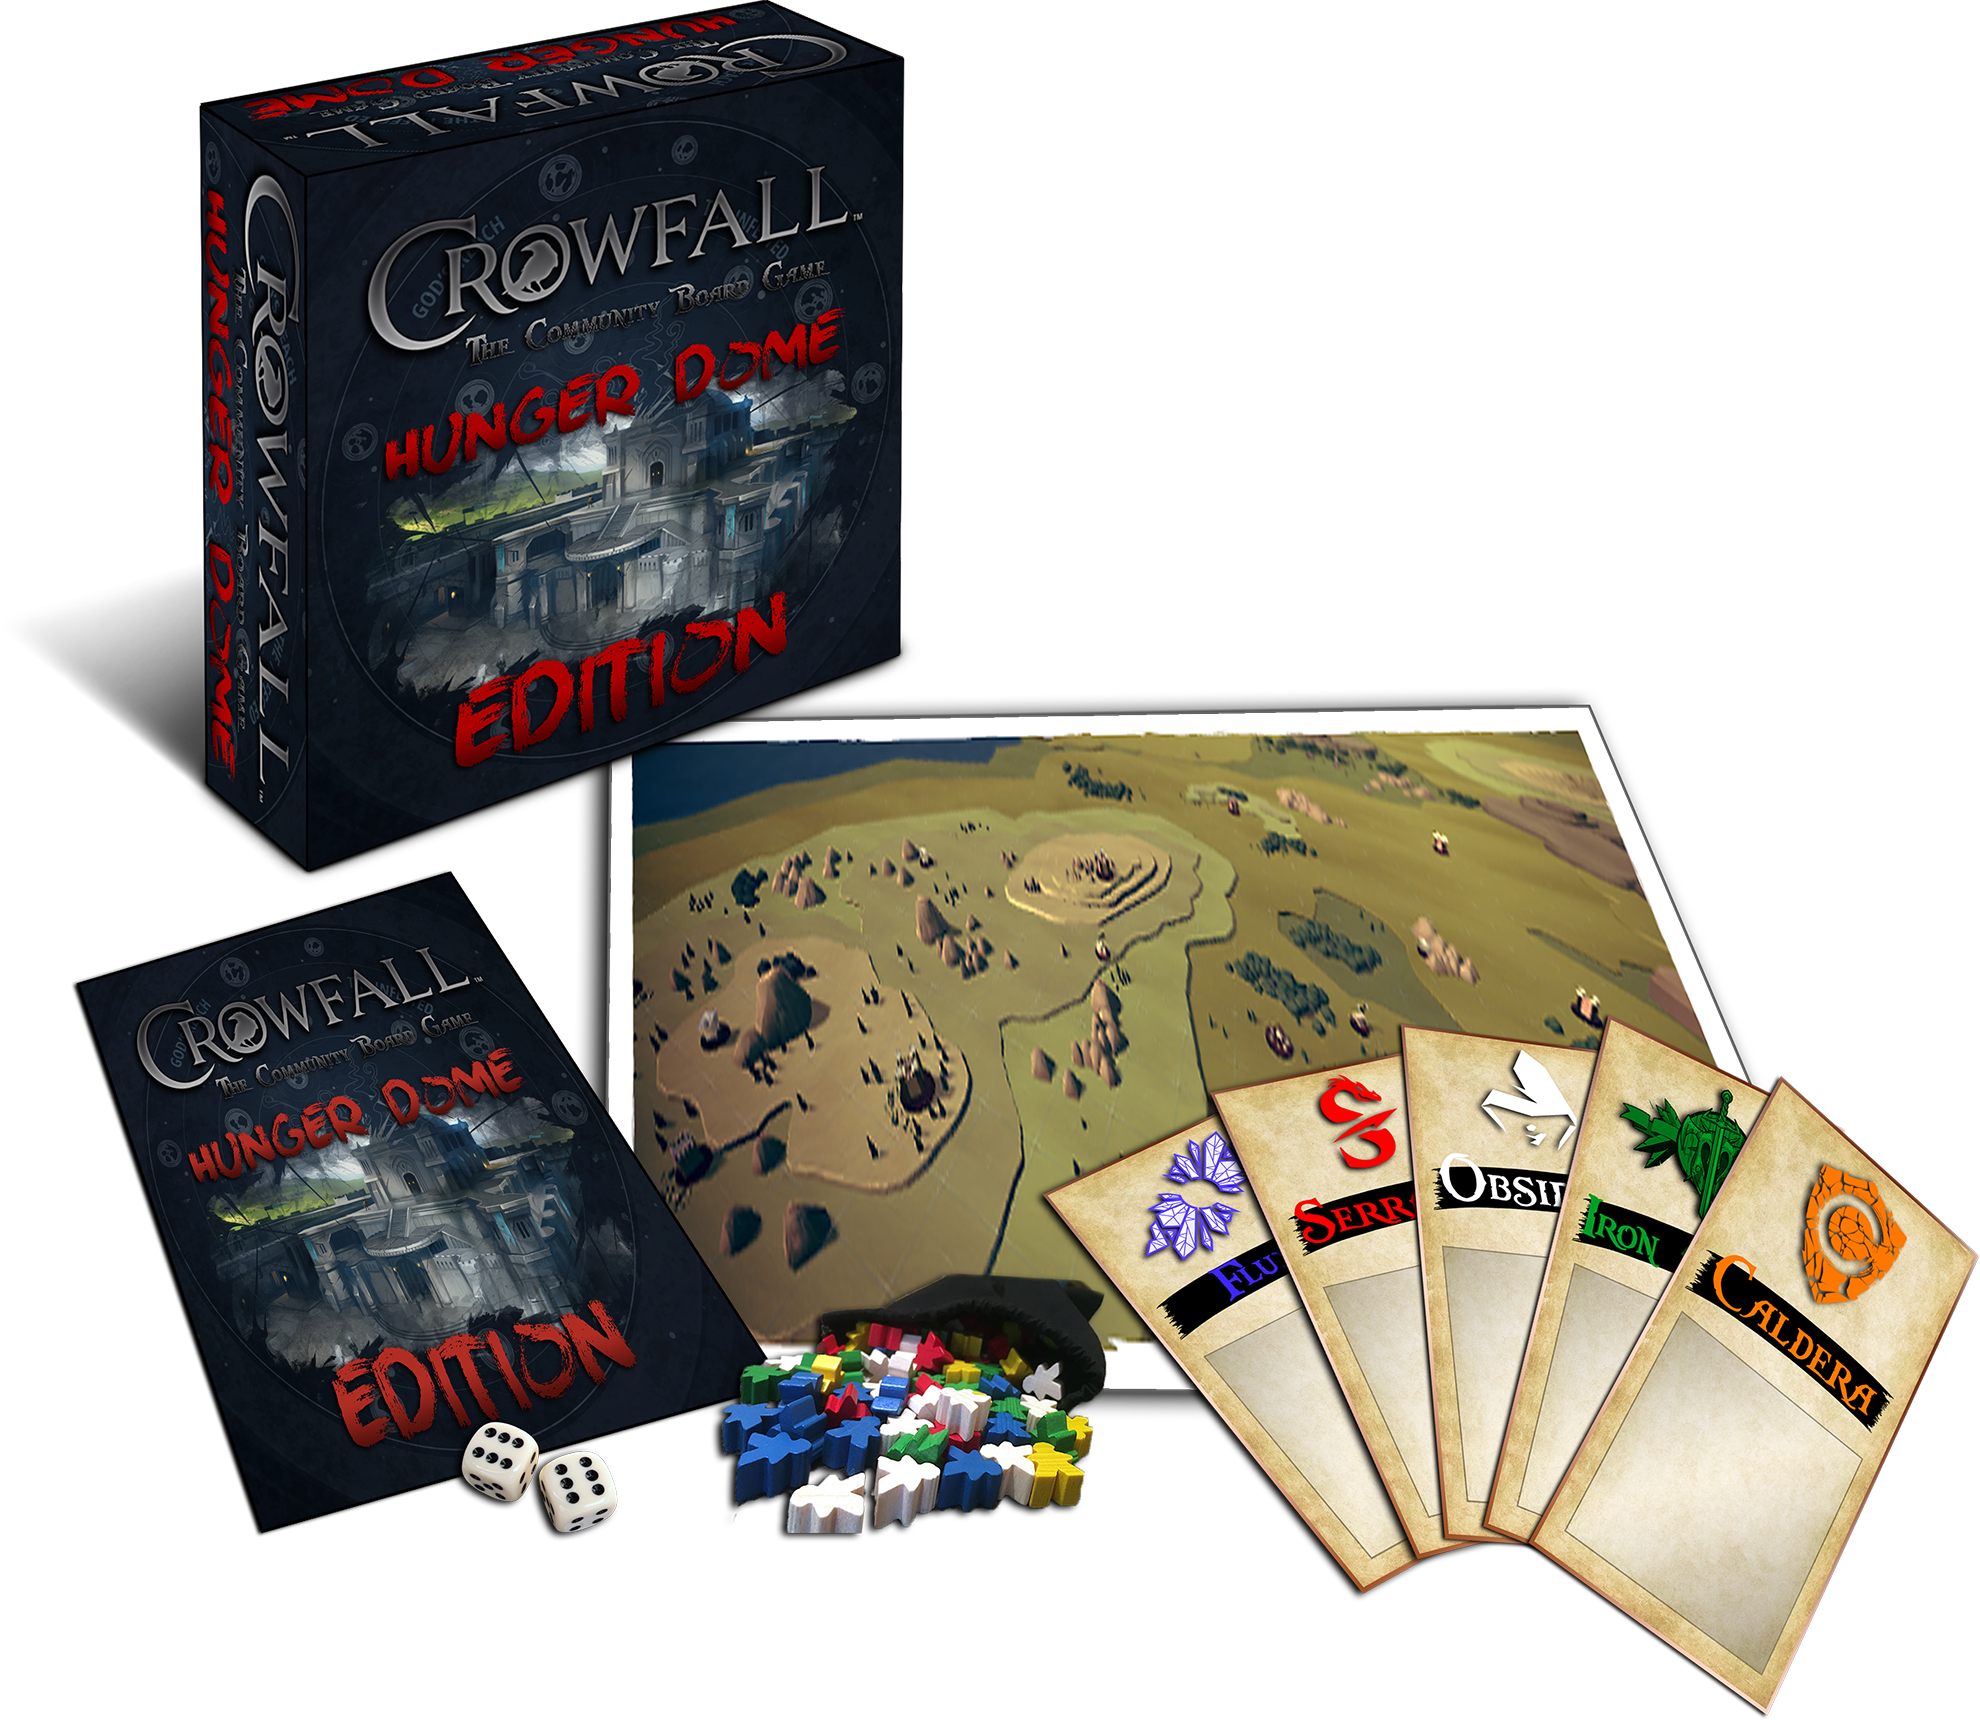 Crowfall_Board_Game_Hungerdome_Editions.